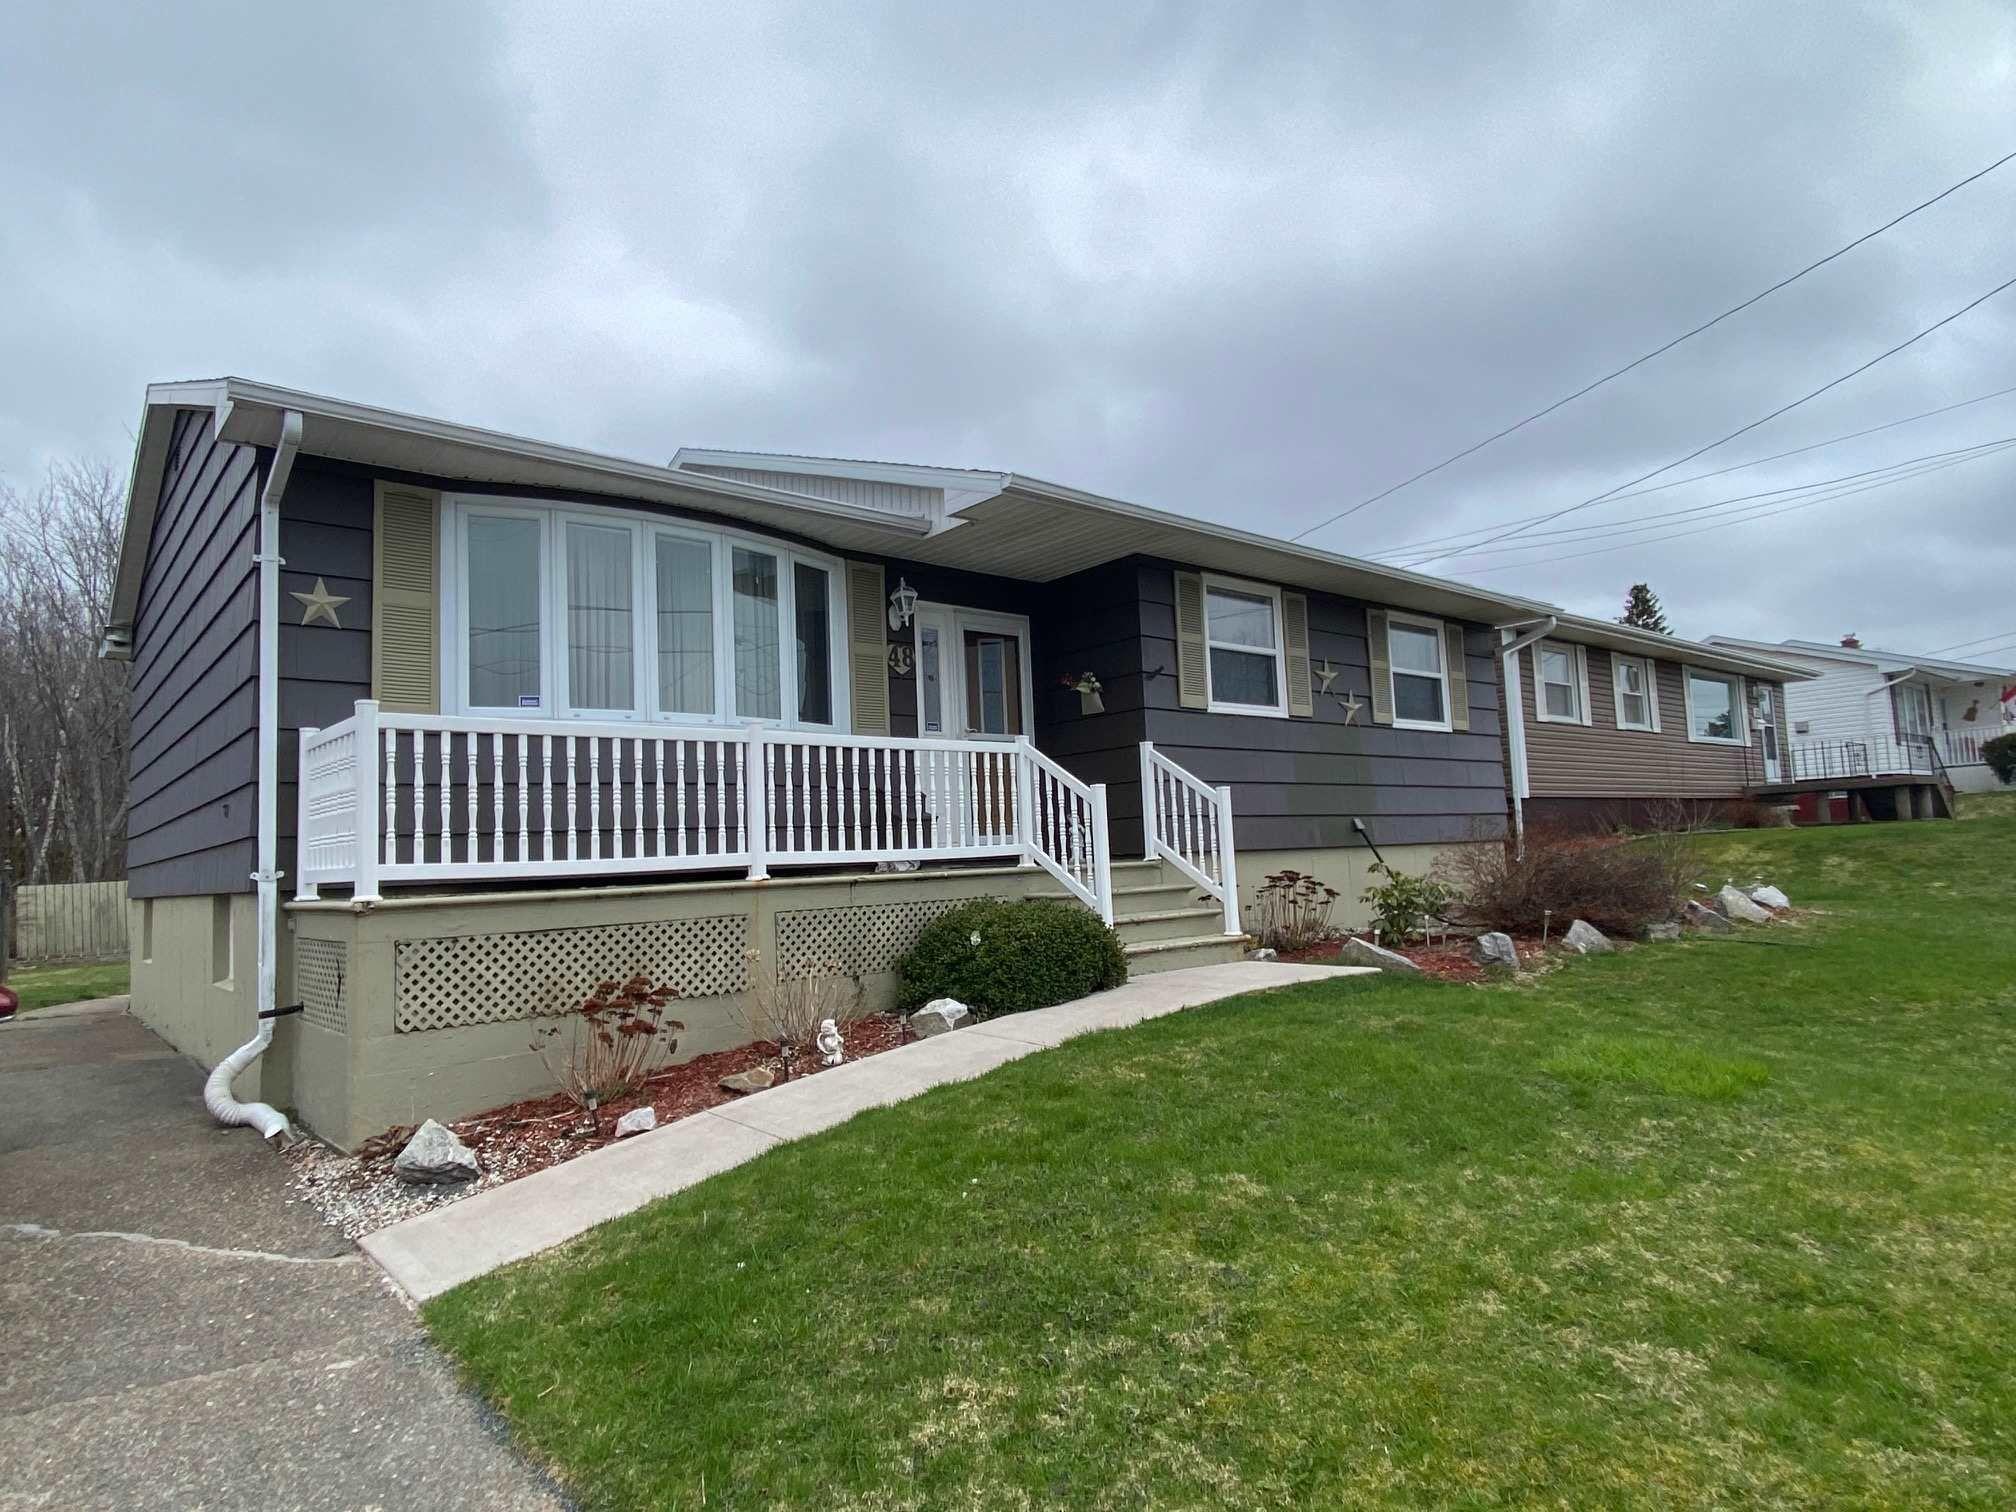 Main Photo: 48 Ranna Drive in Sydney: 201-Sydney Residential for sale (Cape Breton)  : MLS®# 202110054